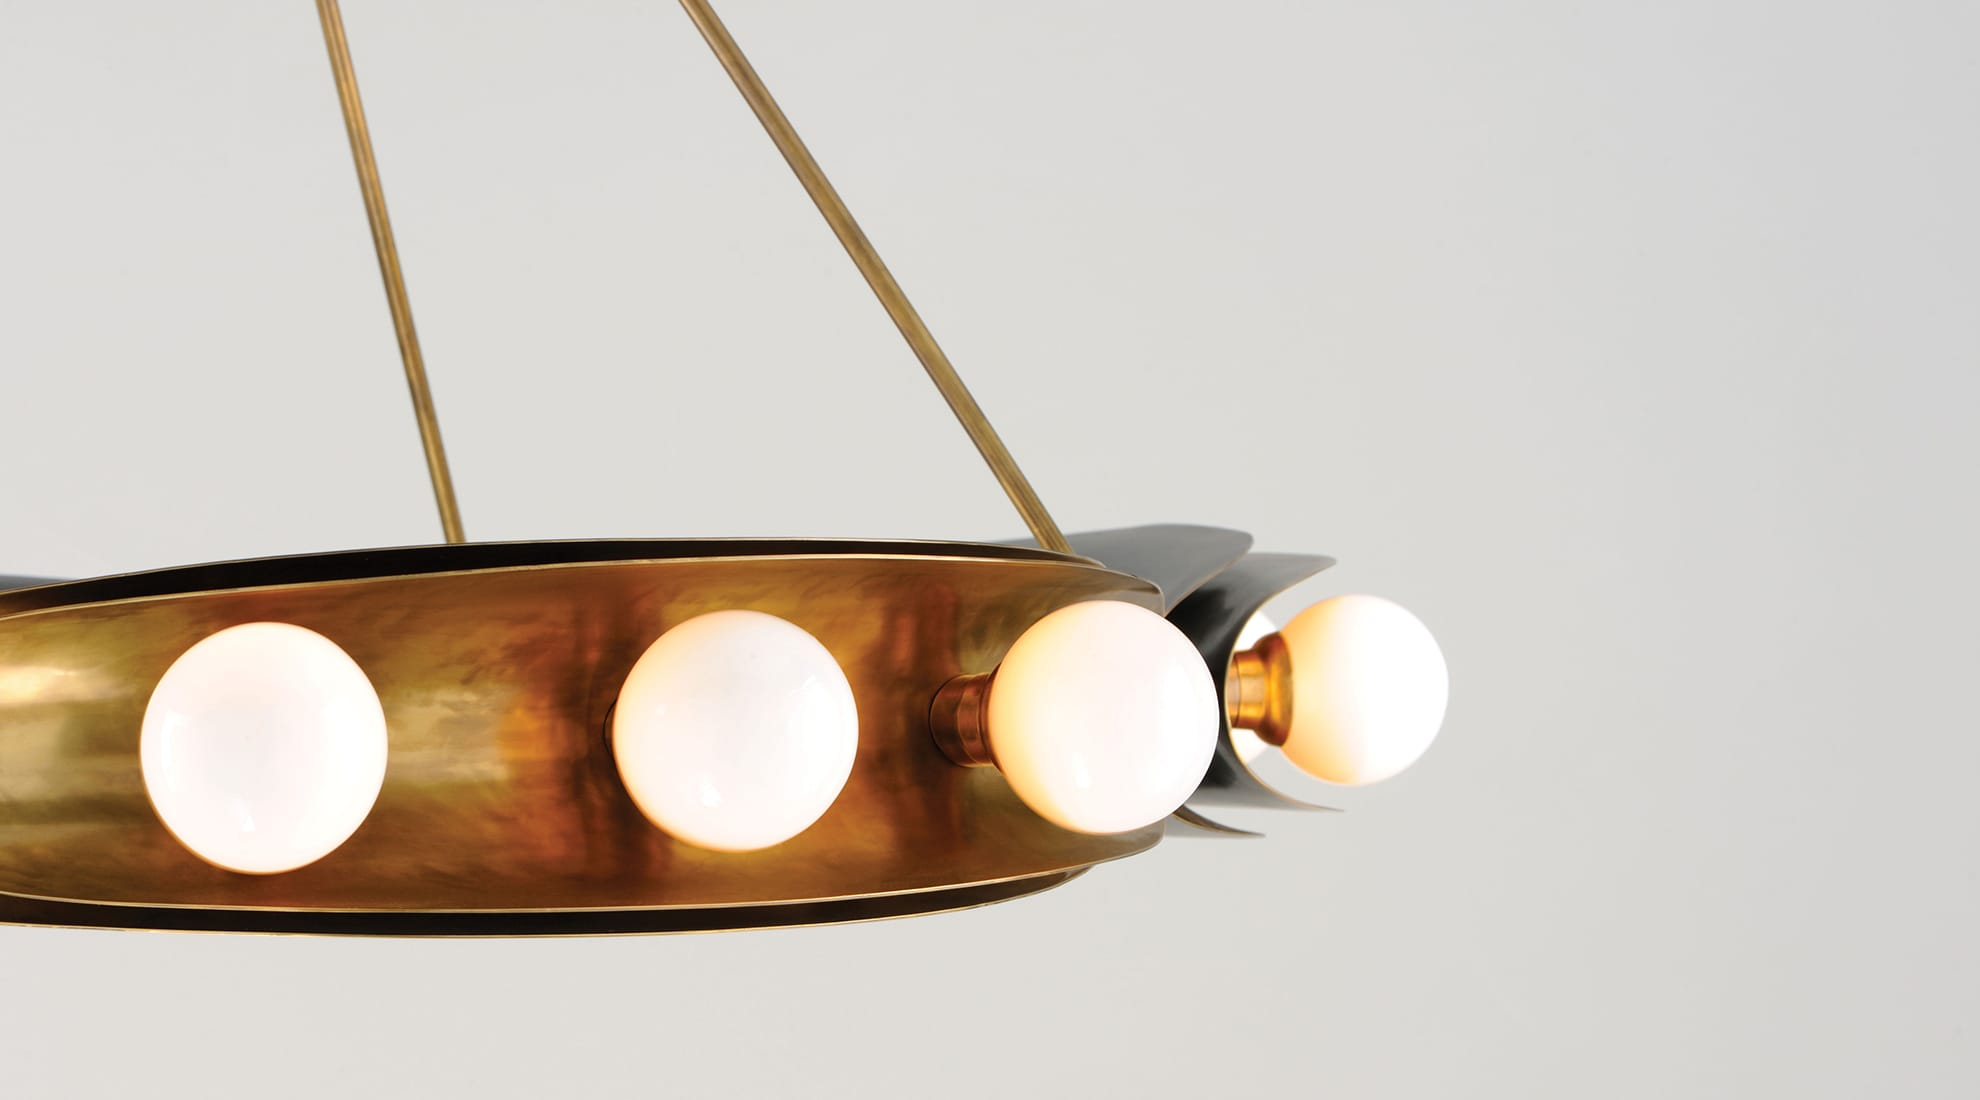 Martyn Lawrence Bullard's Hopper Chandelier for Corbett Lighting